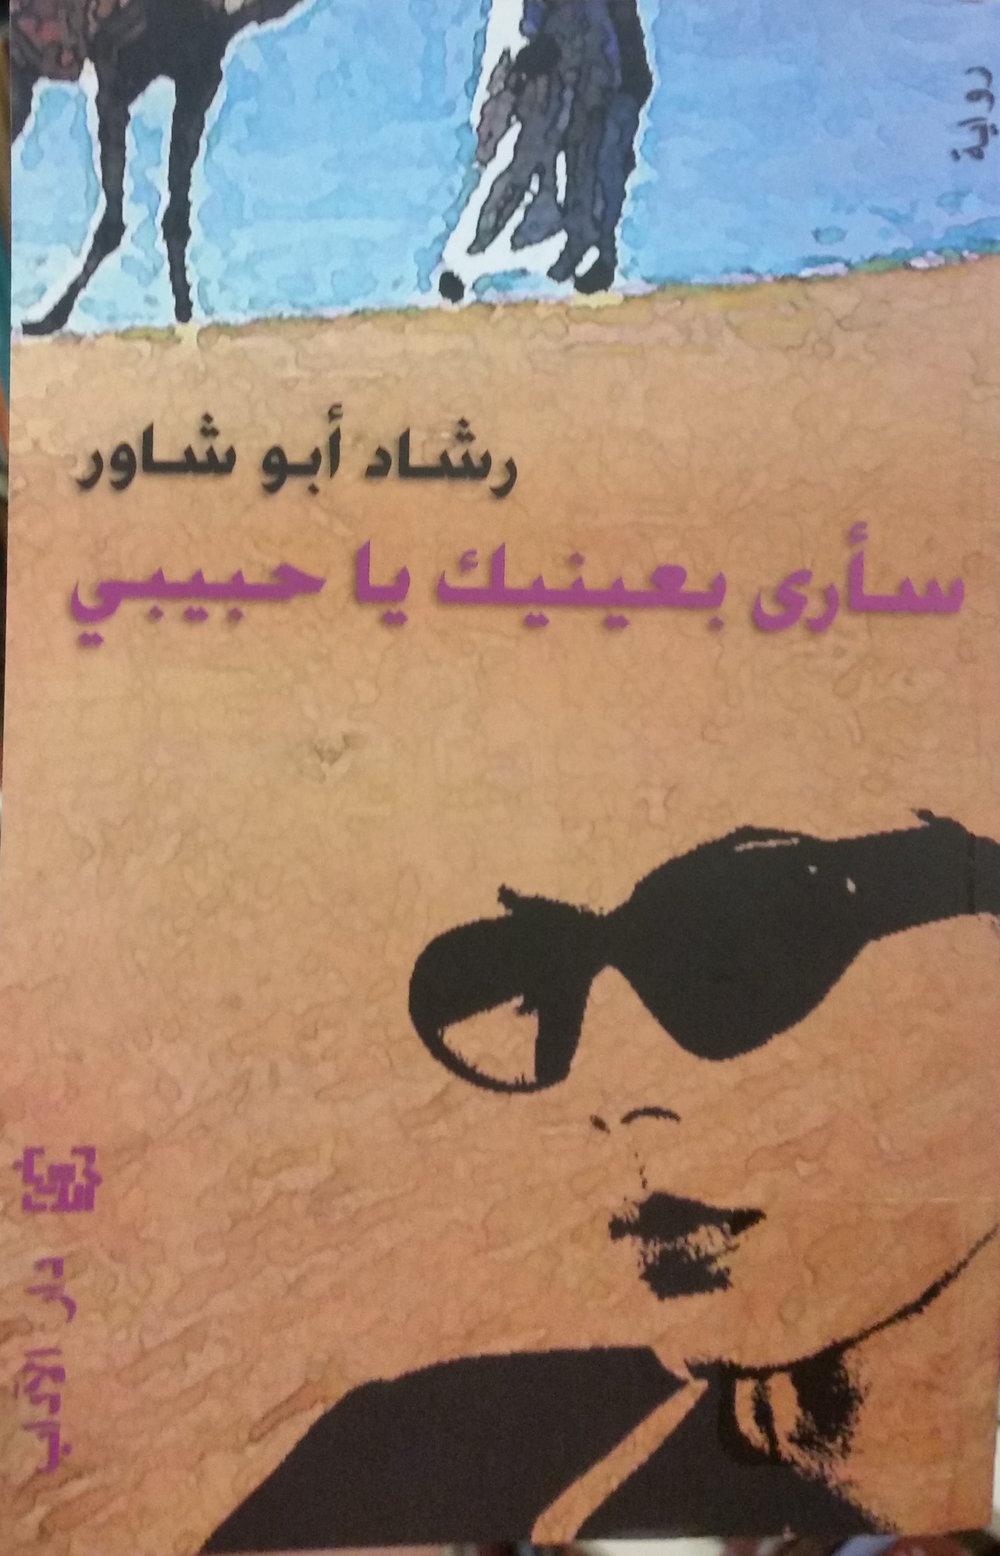 Rashād Abū Shāwar, Sa-arā bi-ʿaynayka yā ḥabibī(Bayrūt: Dār al-Ādāb li-l-Nashr wa-l-Tawzīʻ, 2012).